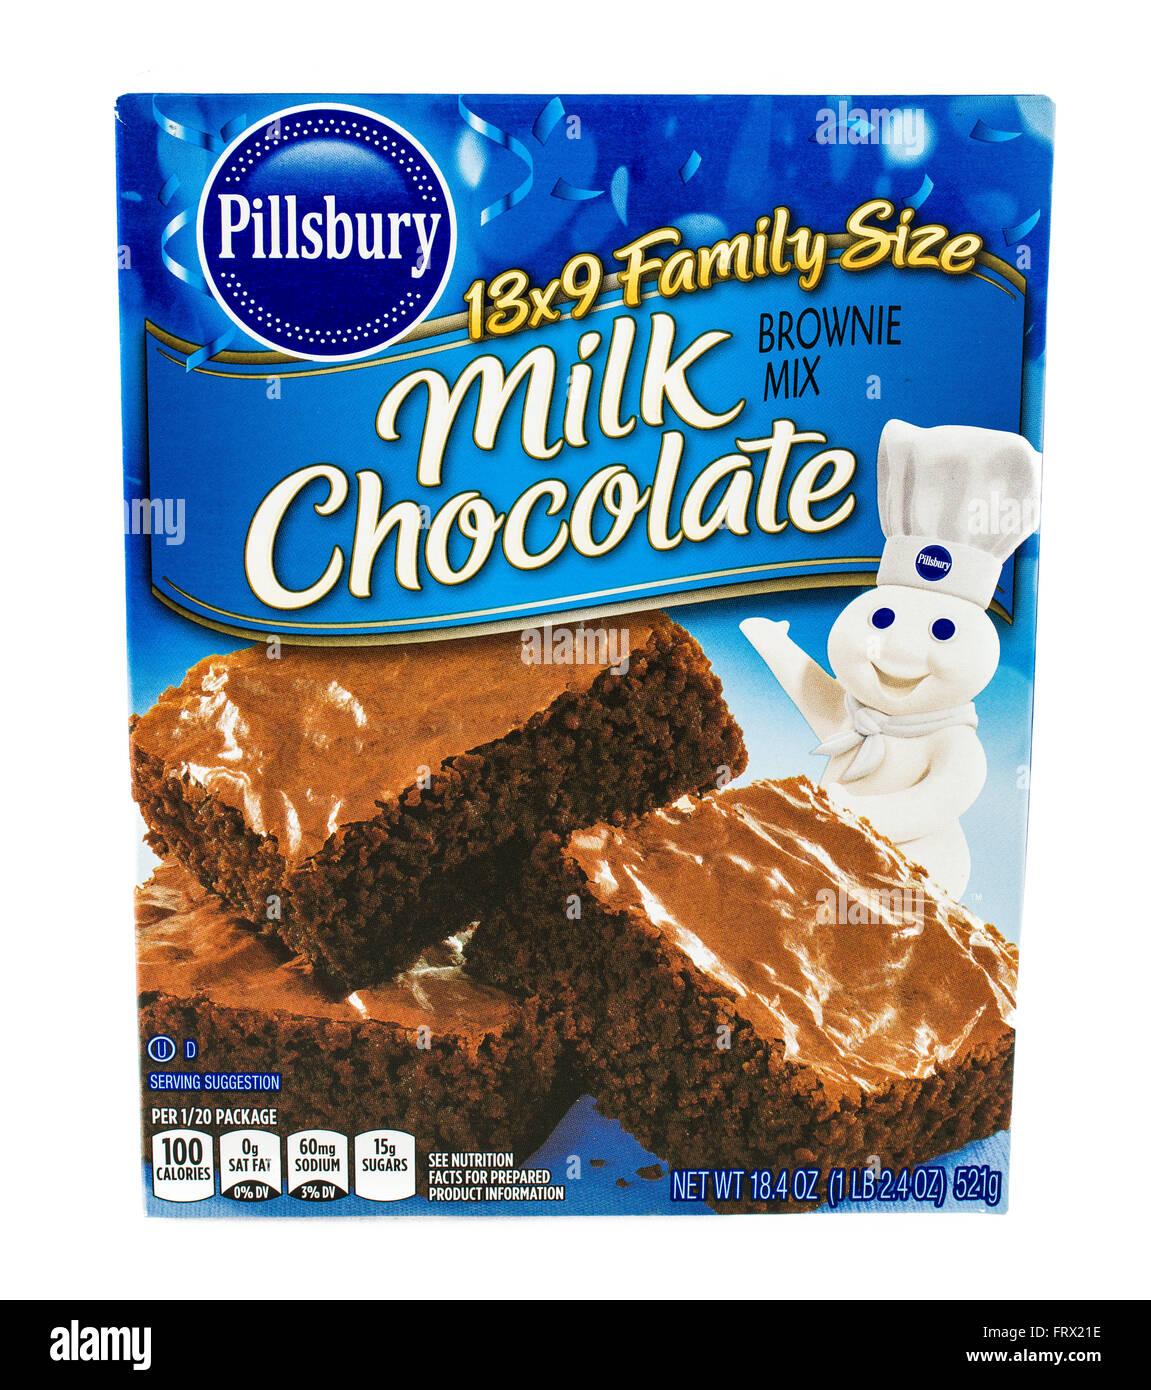 Winneconne, WI - 5 February 2015: Box of Pillsbury Milk Chocolate Brownie Mix. - Stock Image